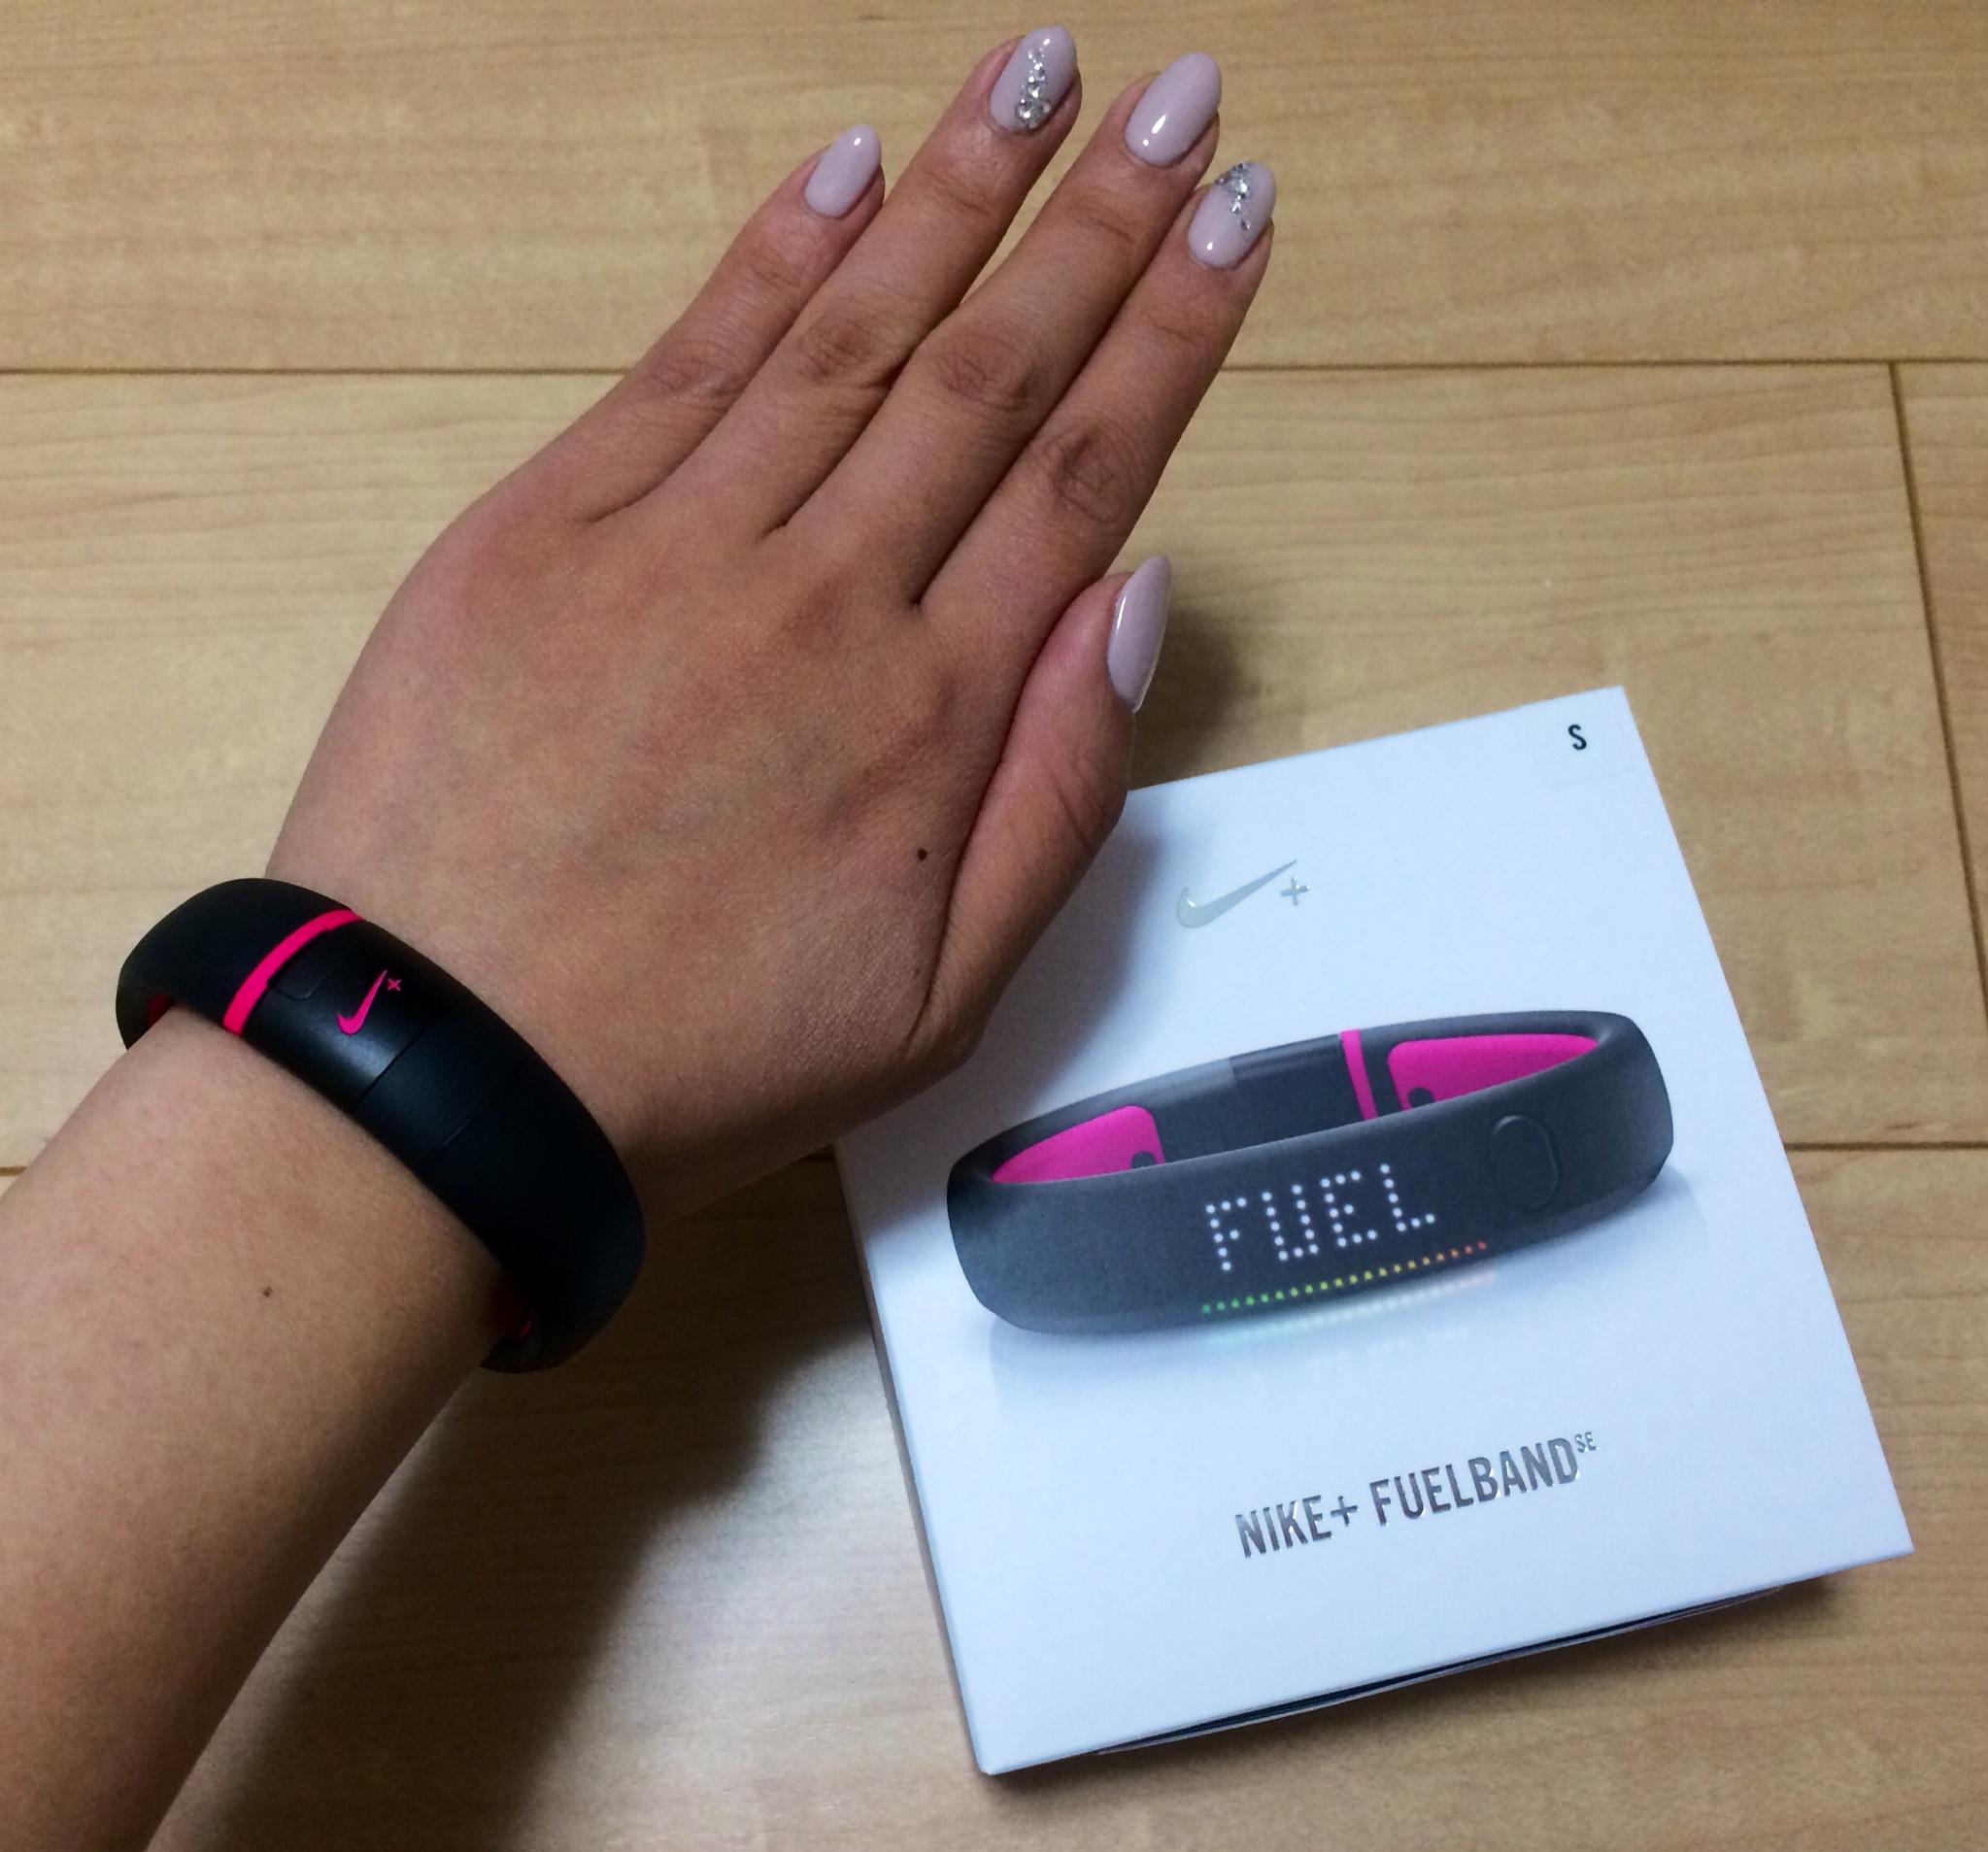 Nikefuelband 131106